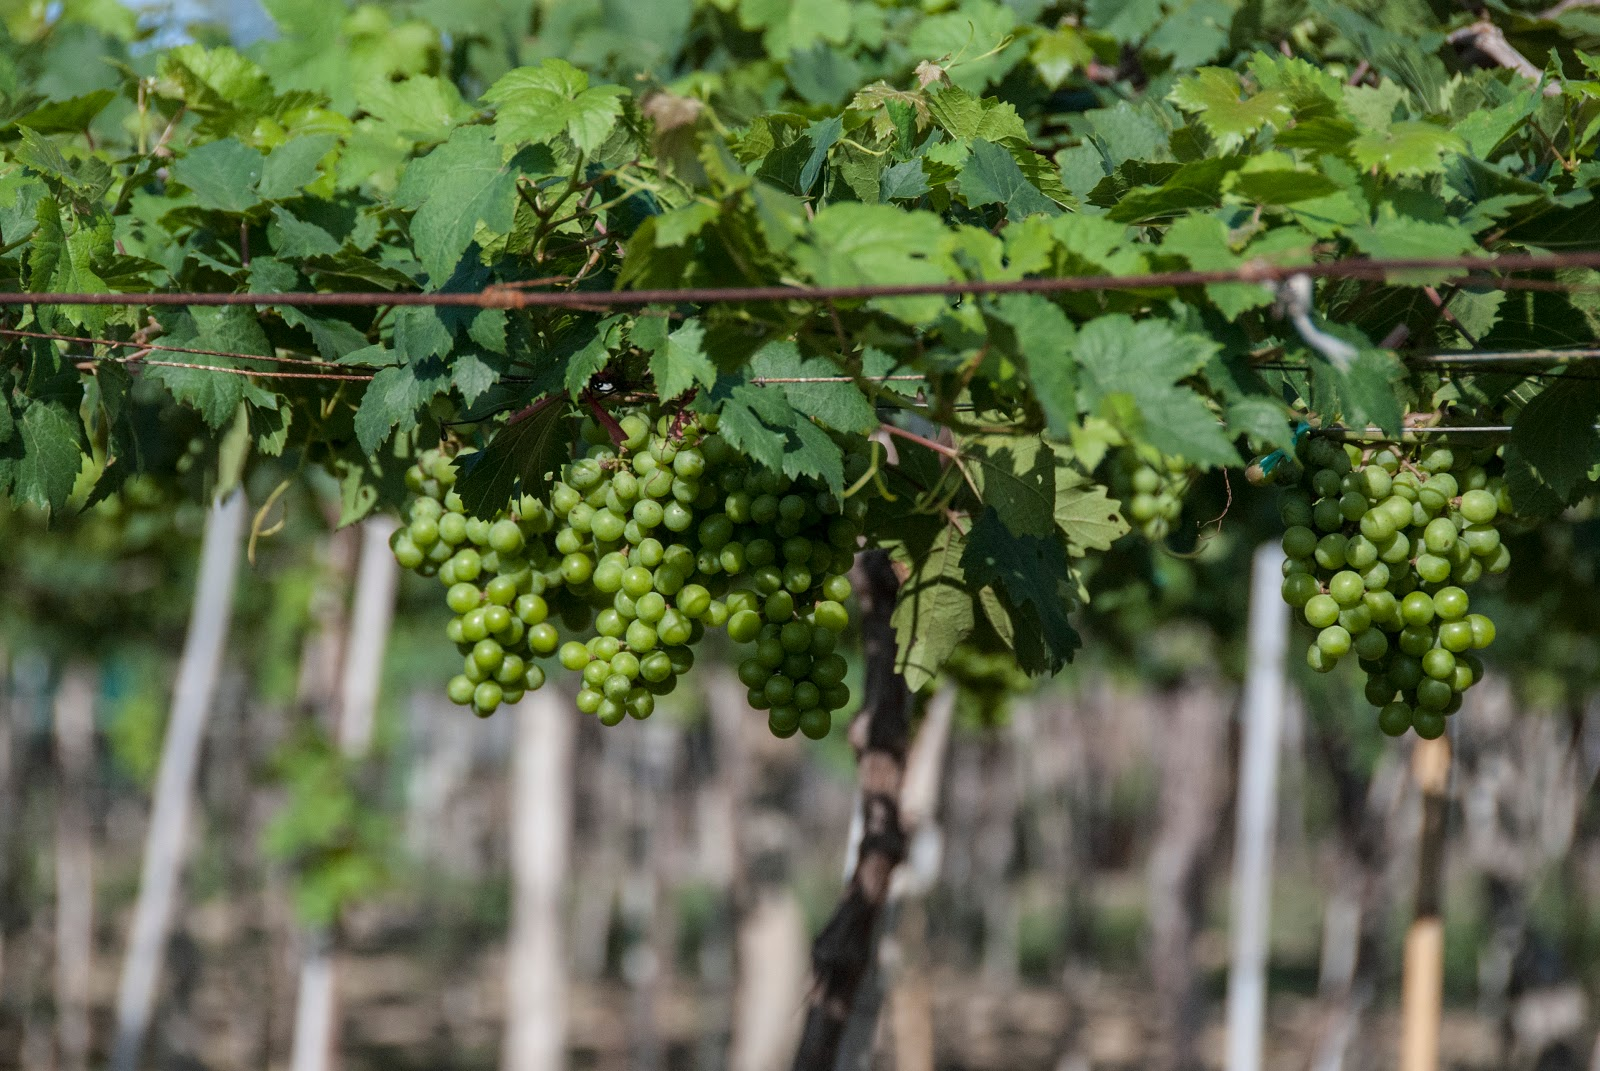 Ba Moi vineyard